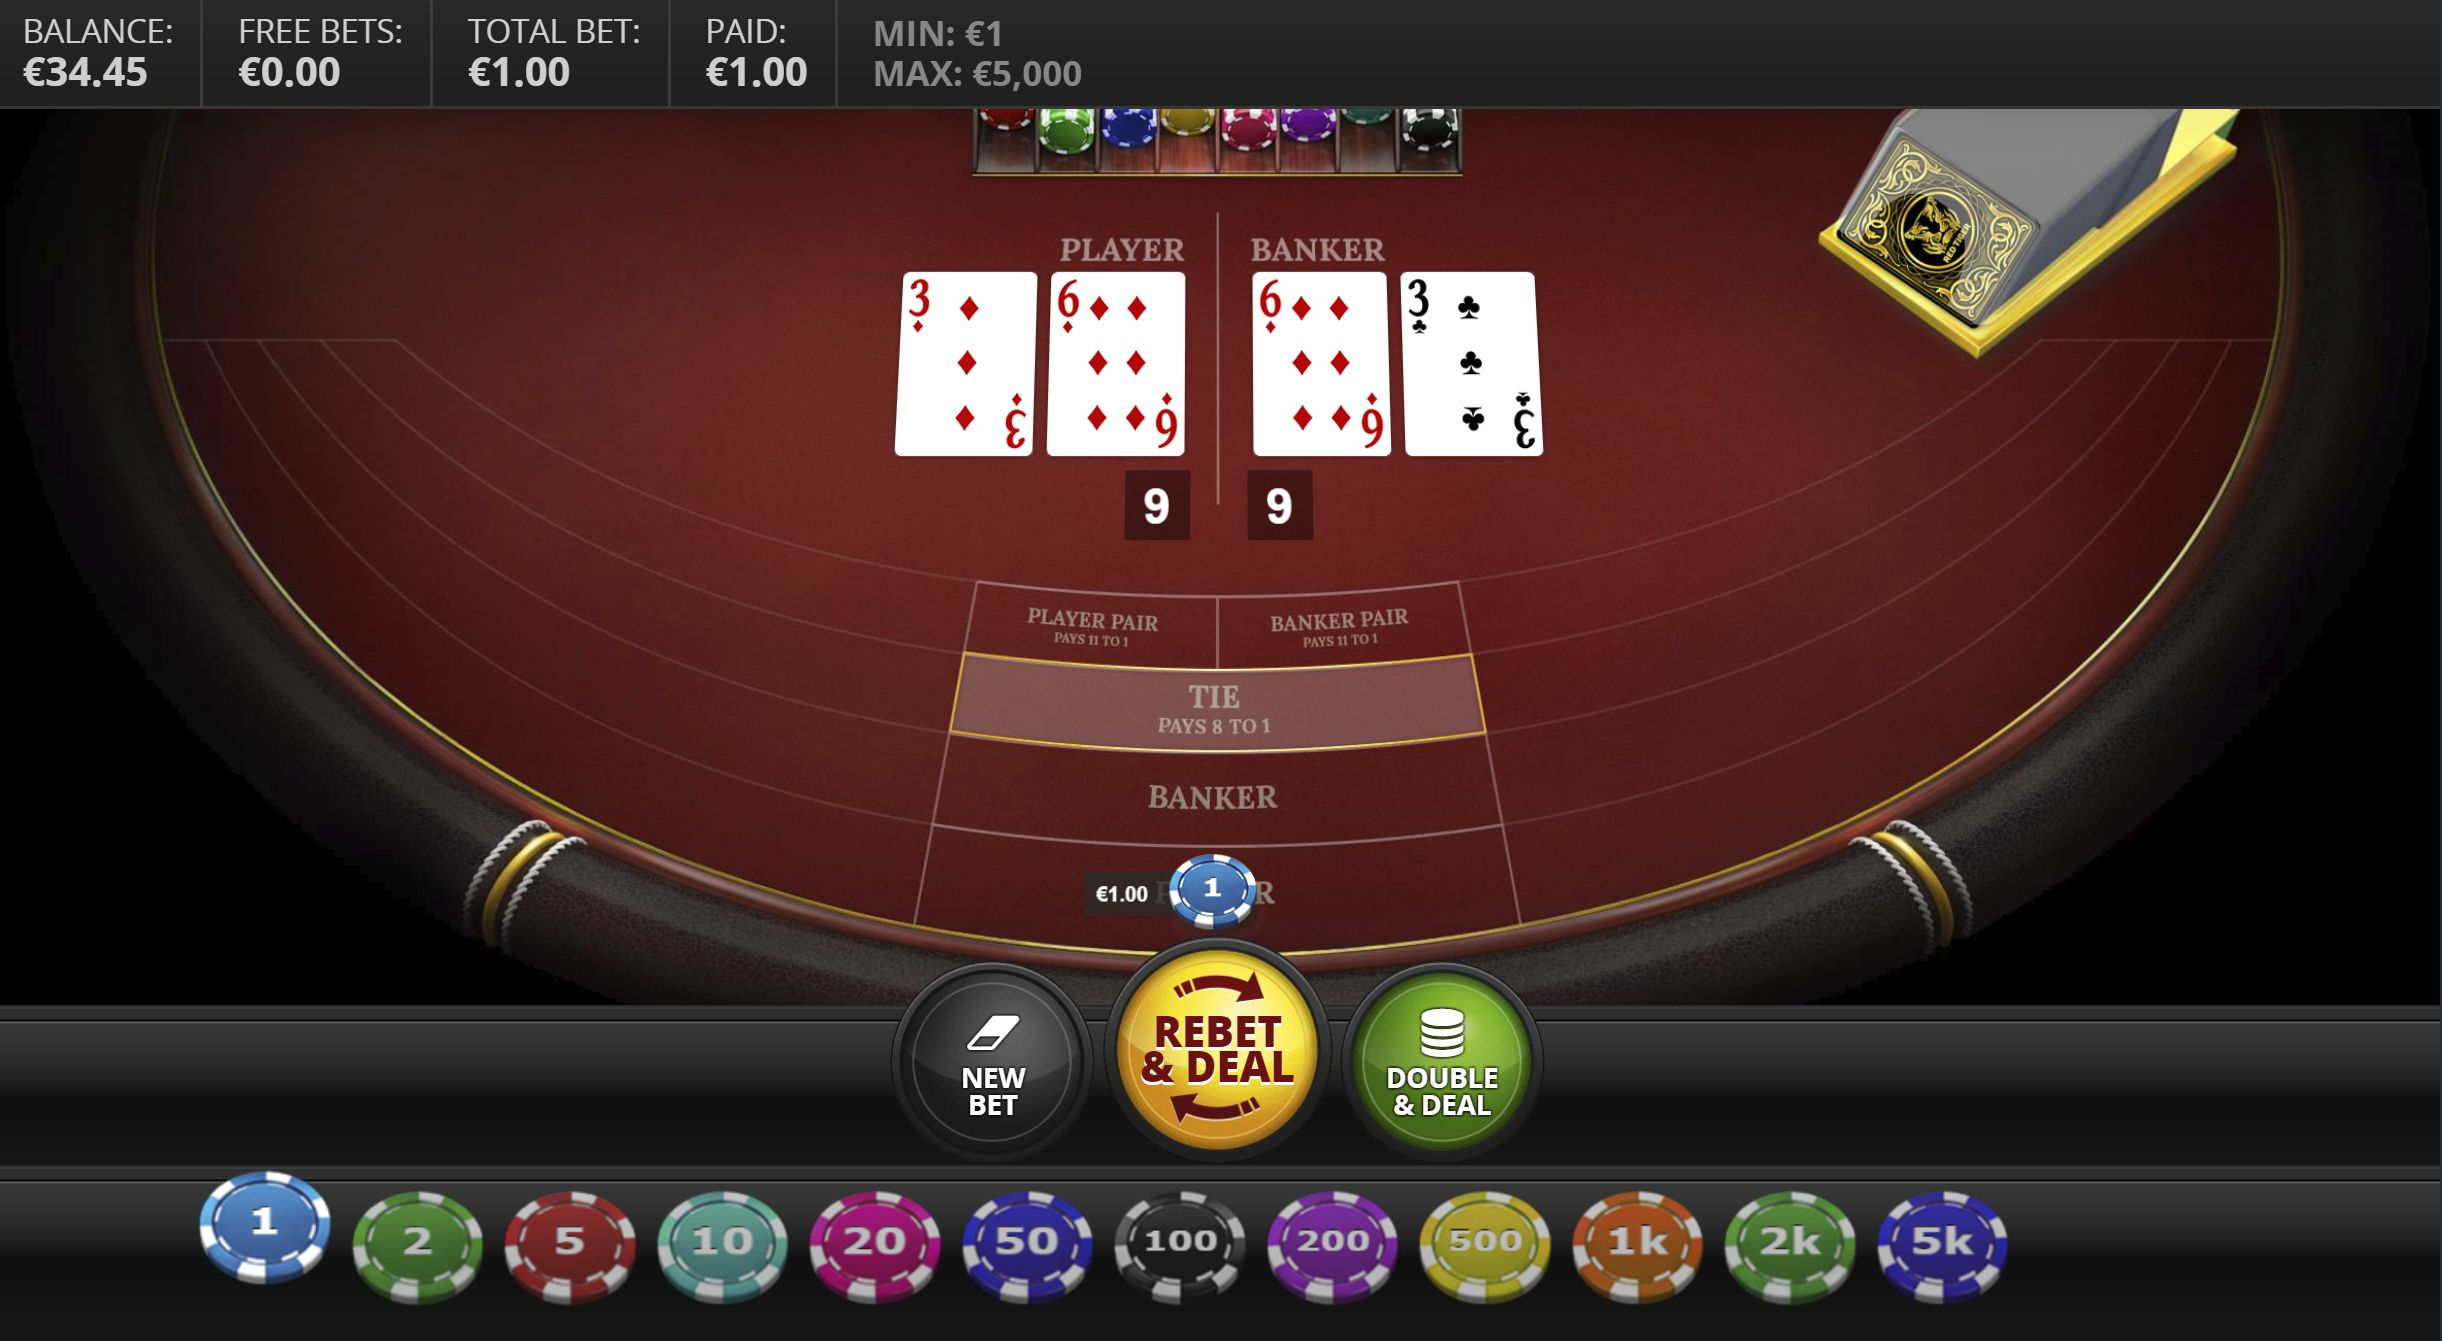 online casino kartenglücksspiel live casino baccarat kasino kartenspiel